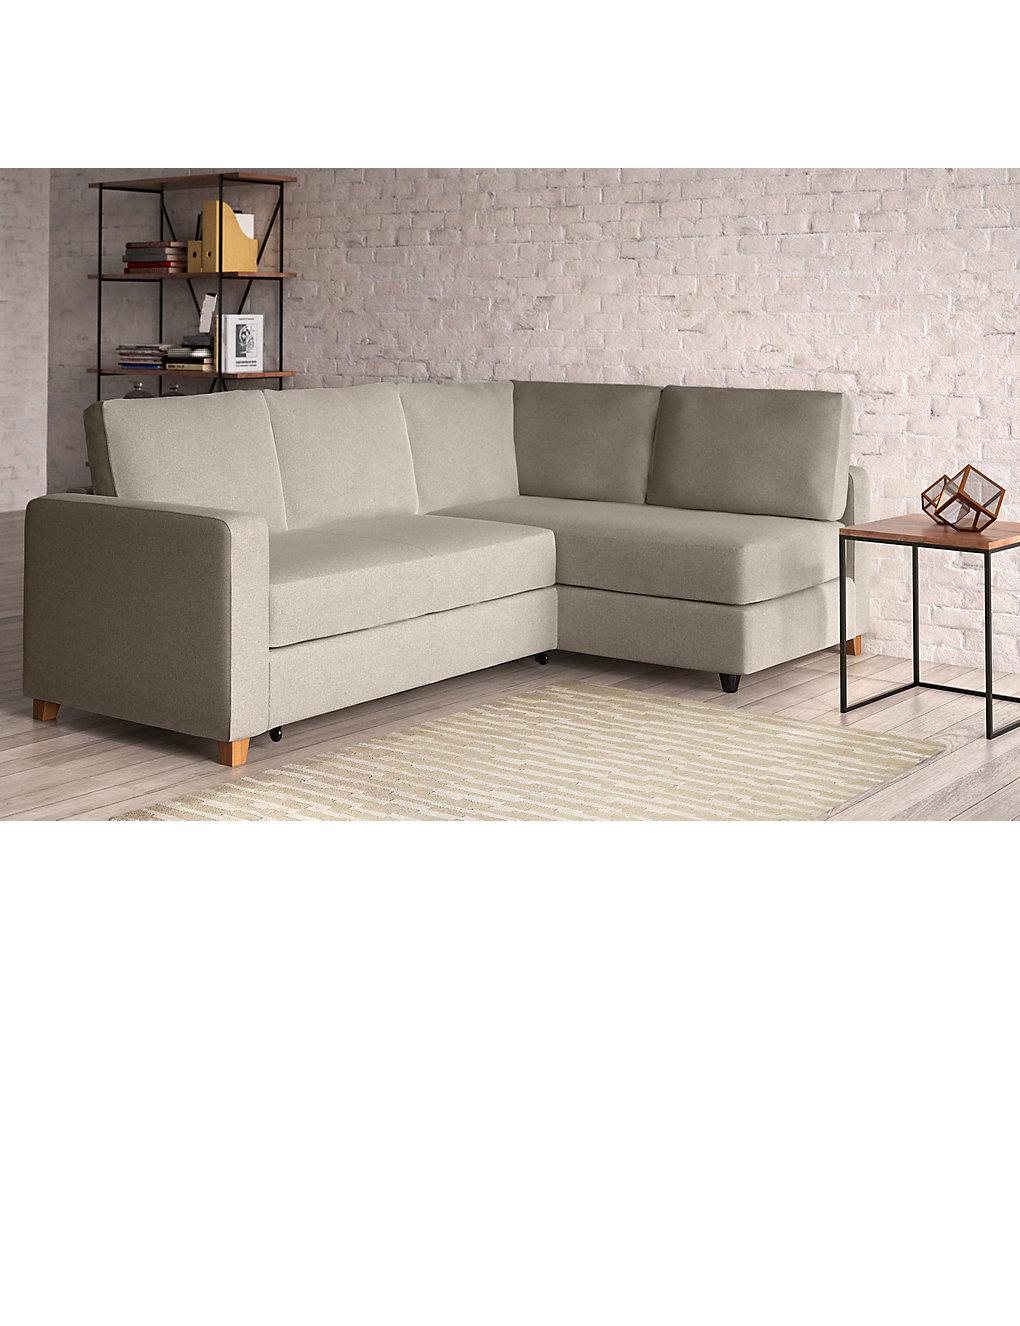 Tromso Corner Sofa Bed Right Hand